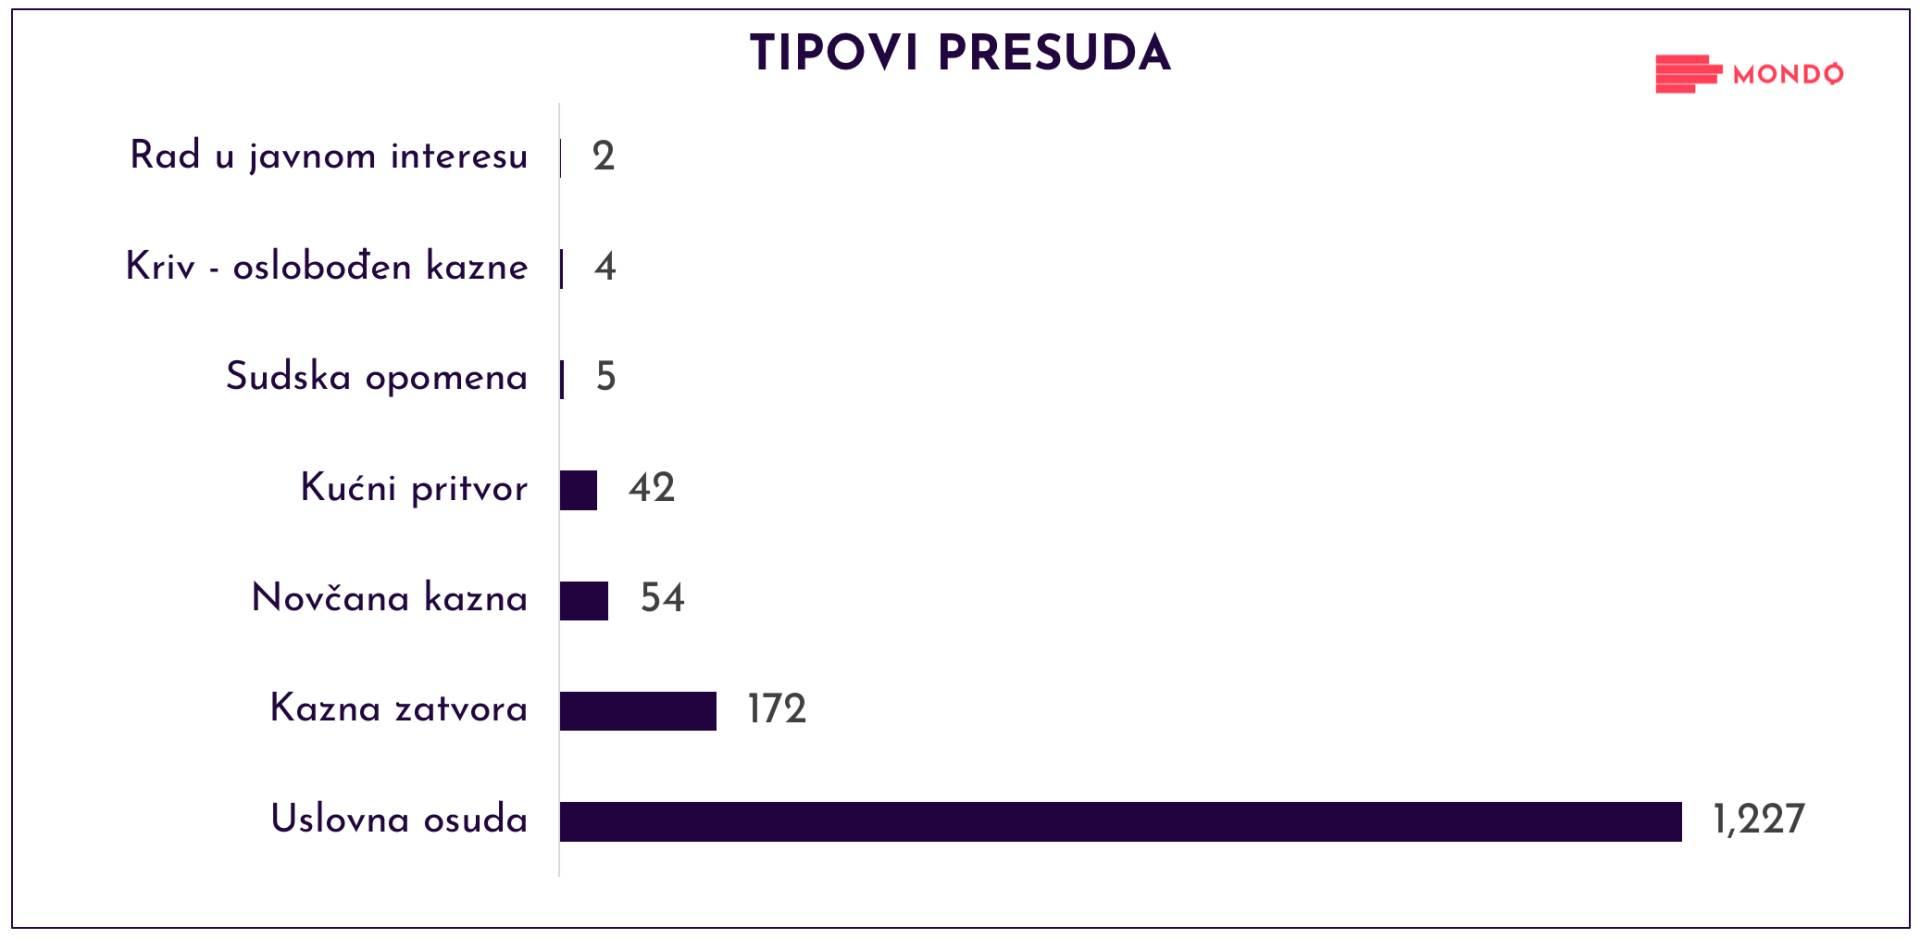 Alimentacija u Srbiji: Tipovi presuda